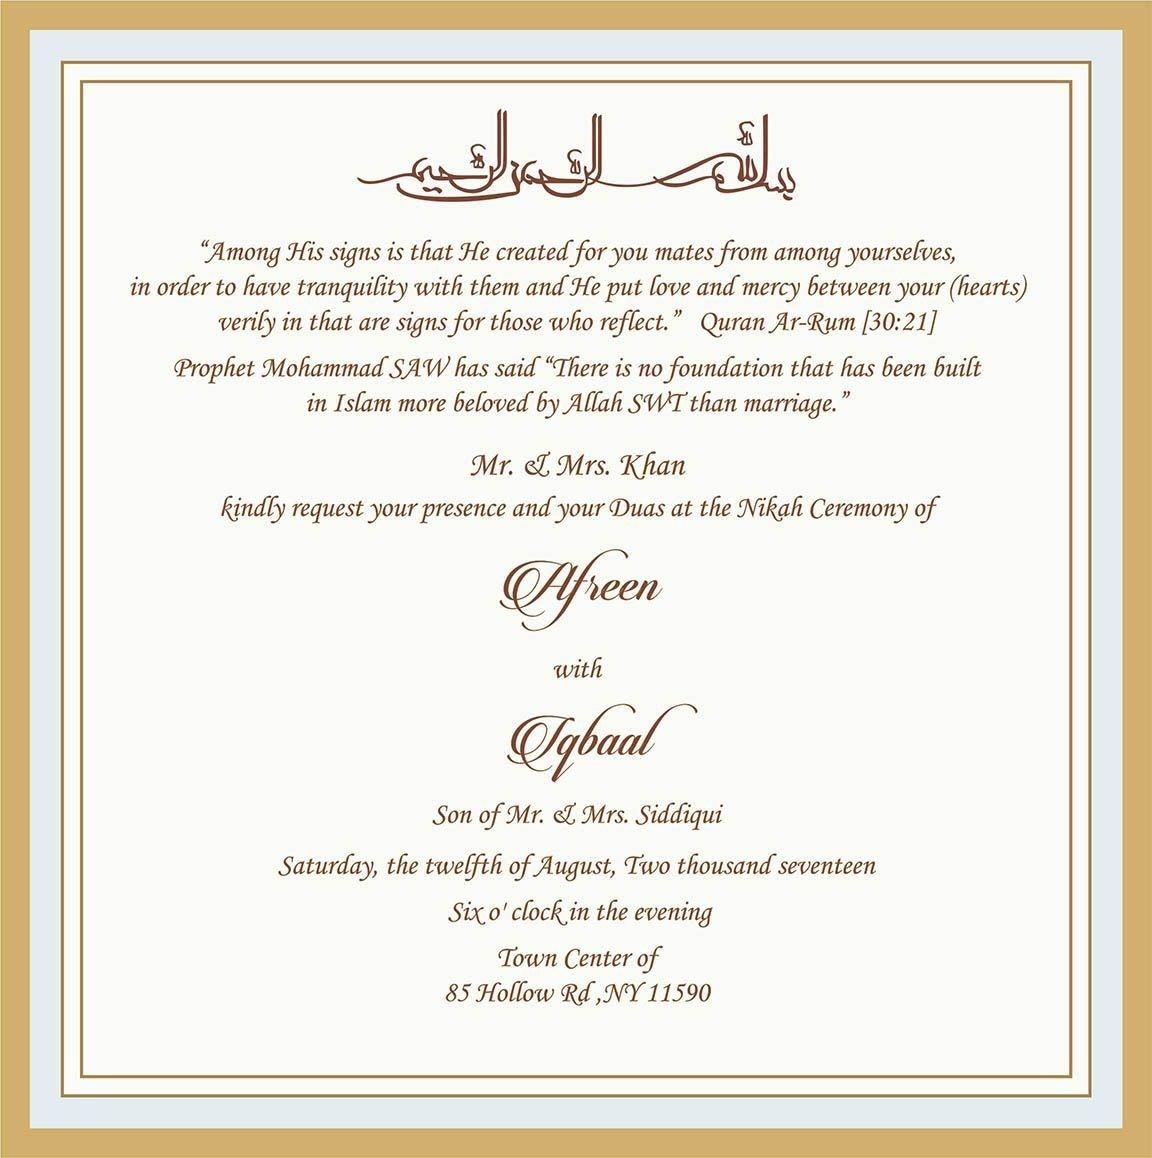 Muslim Wedding Invitations Wedding Invitation Wording For Muslim Wedding Ceremony Muslim Denchaihosp Com Muslim Wedding Invitations Muslim Wedding Ceremony Wedding Card Wordings